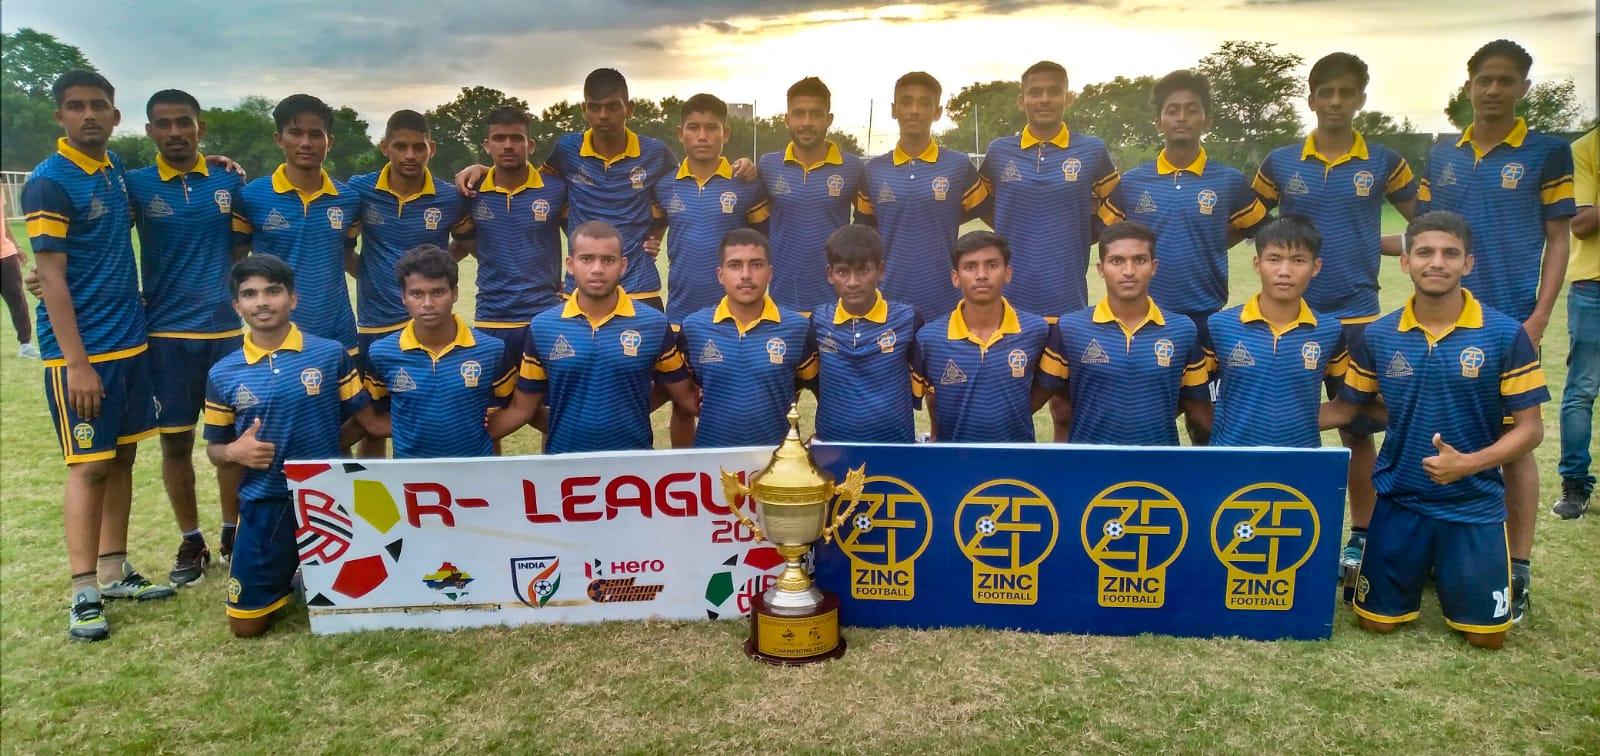 Zinc FA Rajasthan League 2021 Champions